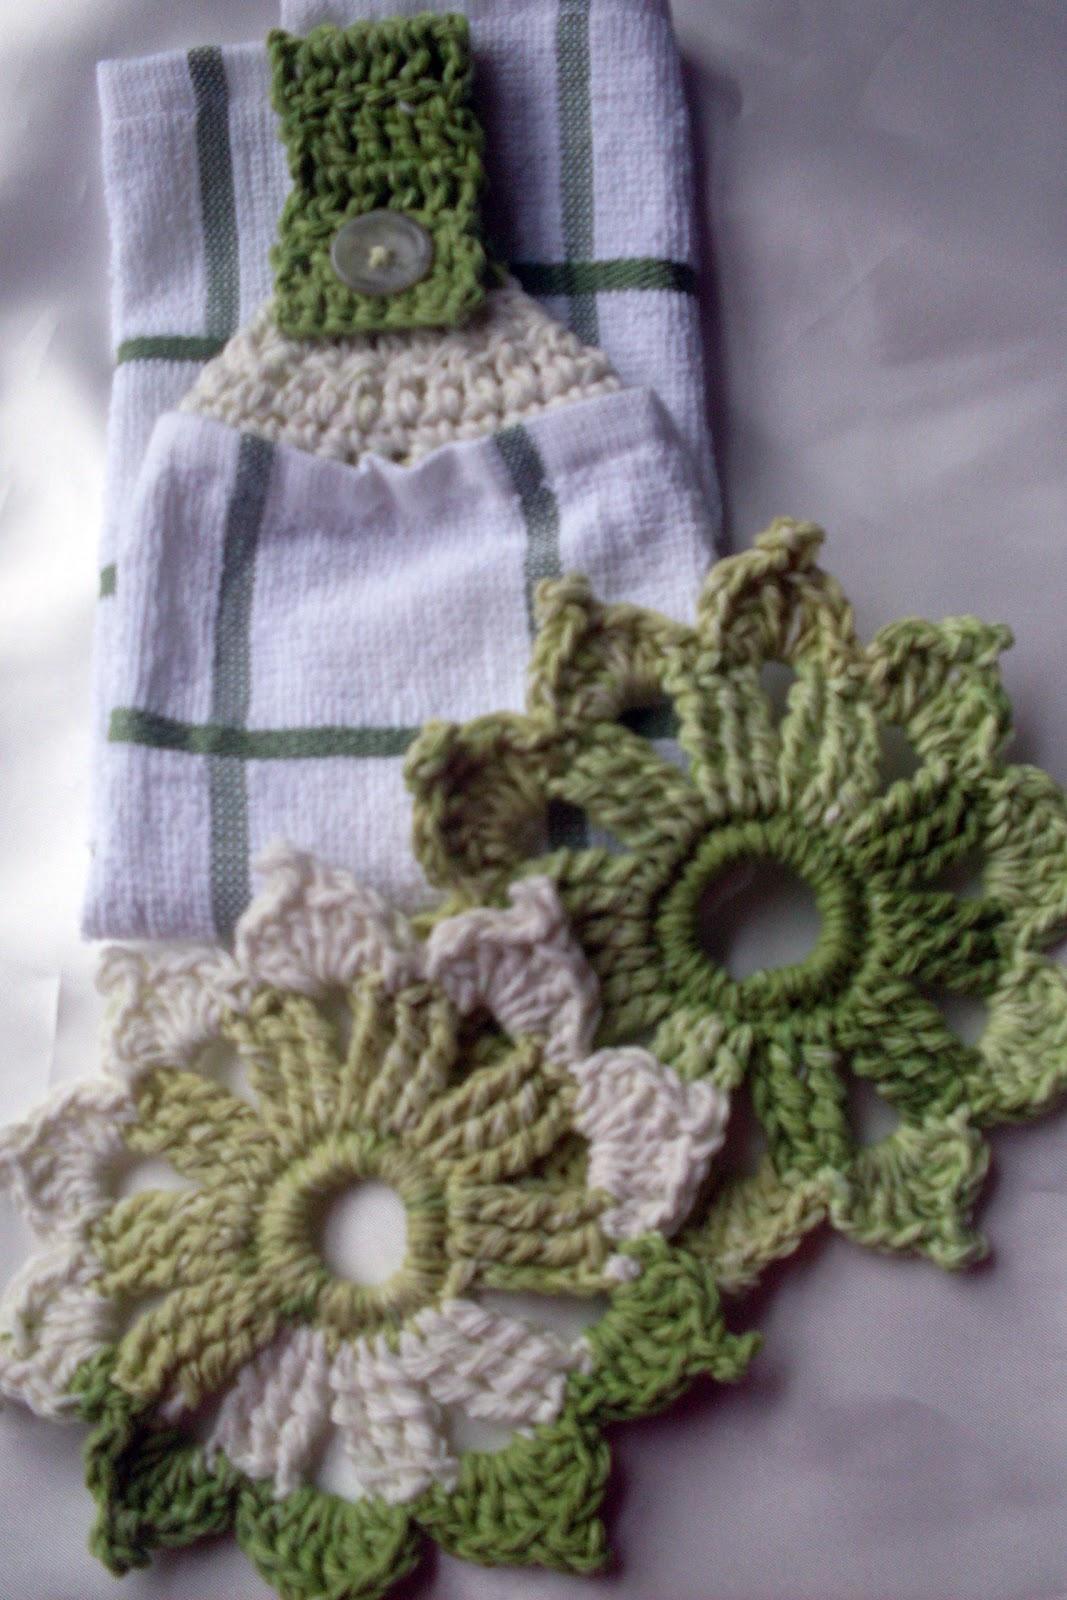 Crafty Leslies Blog: More Crochet Kitchen Items - Free Pattern!